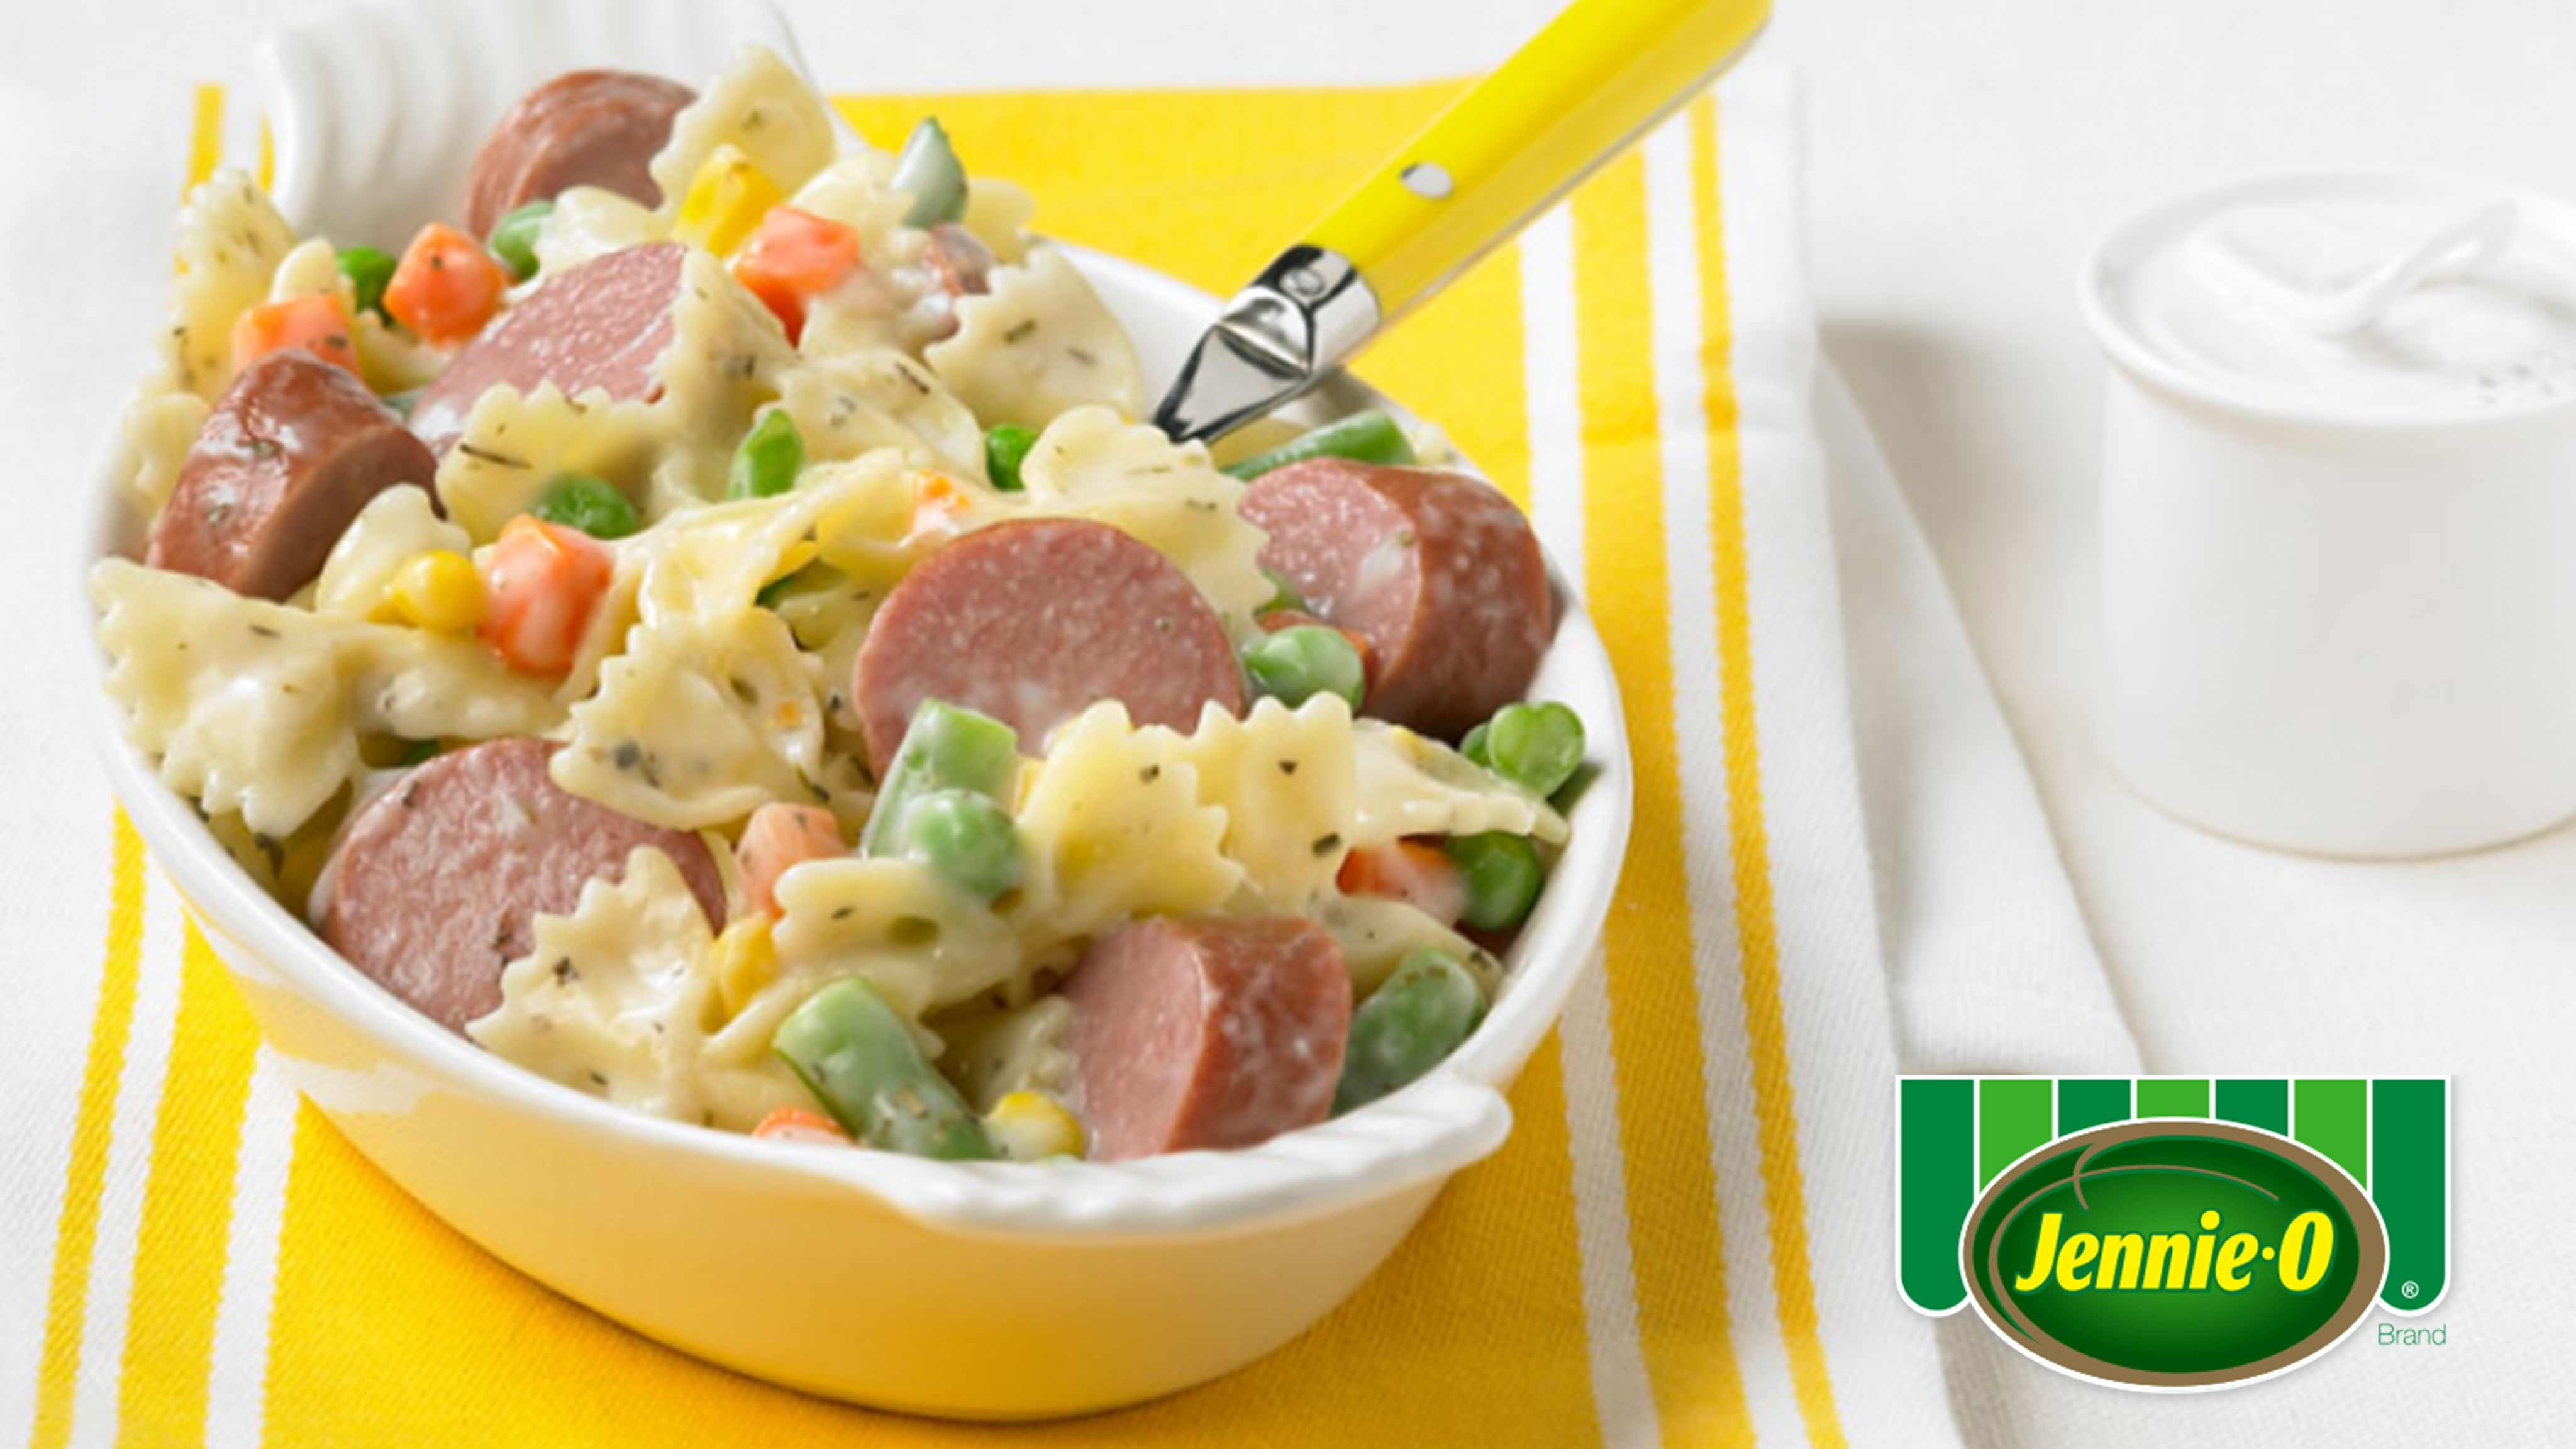 Image for Recipe Bow Tie Pasta with Turkey Kielbasa